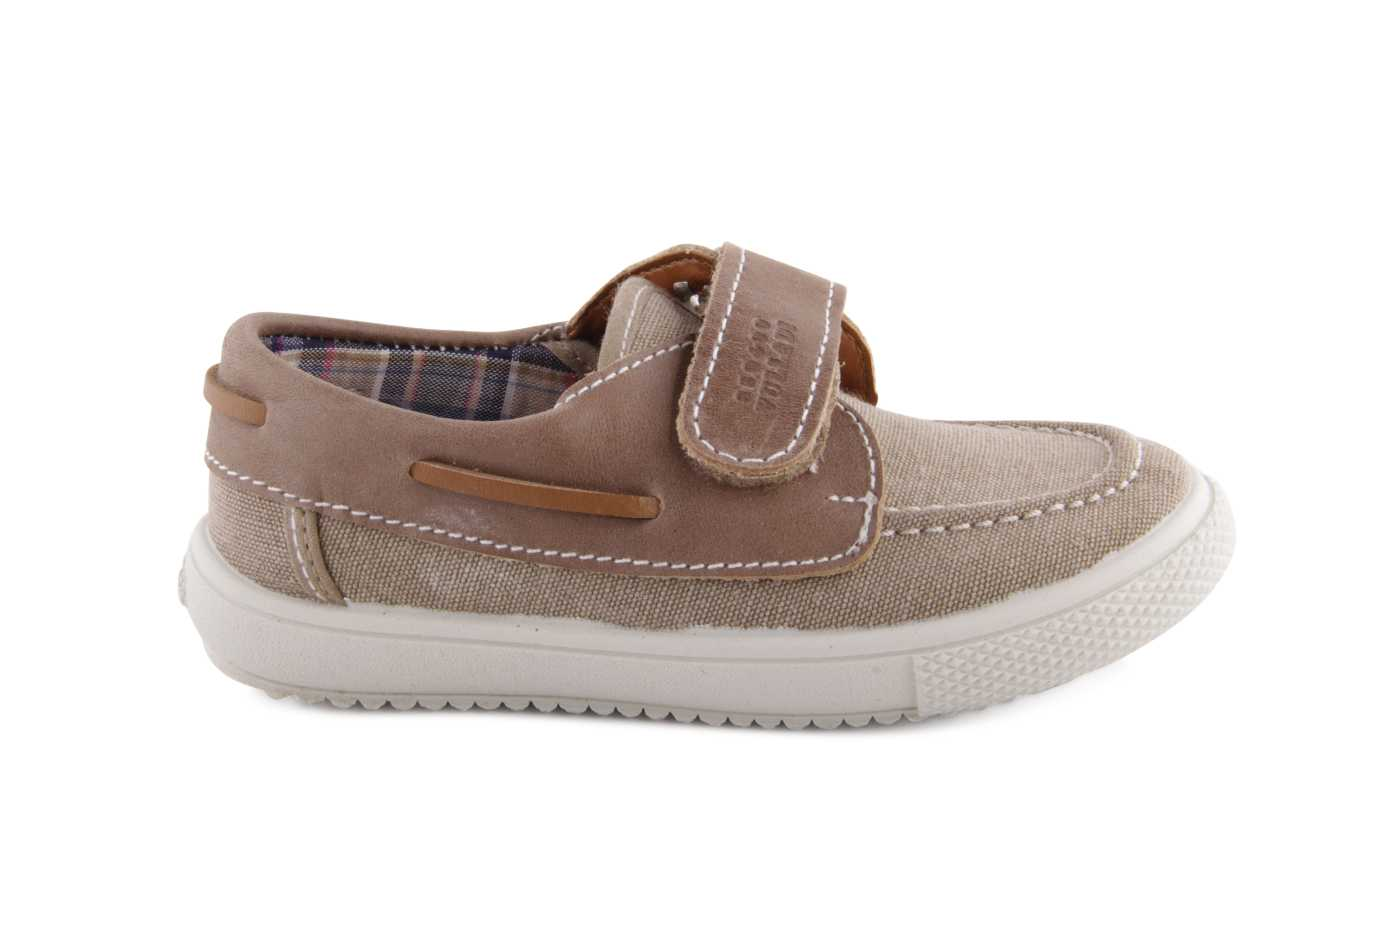 6f9f598cc11a5 Comprar zapato tipo JOVEN NIÑO estilo LONA COLOR CAMEL TEXTIL ...